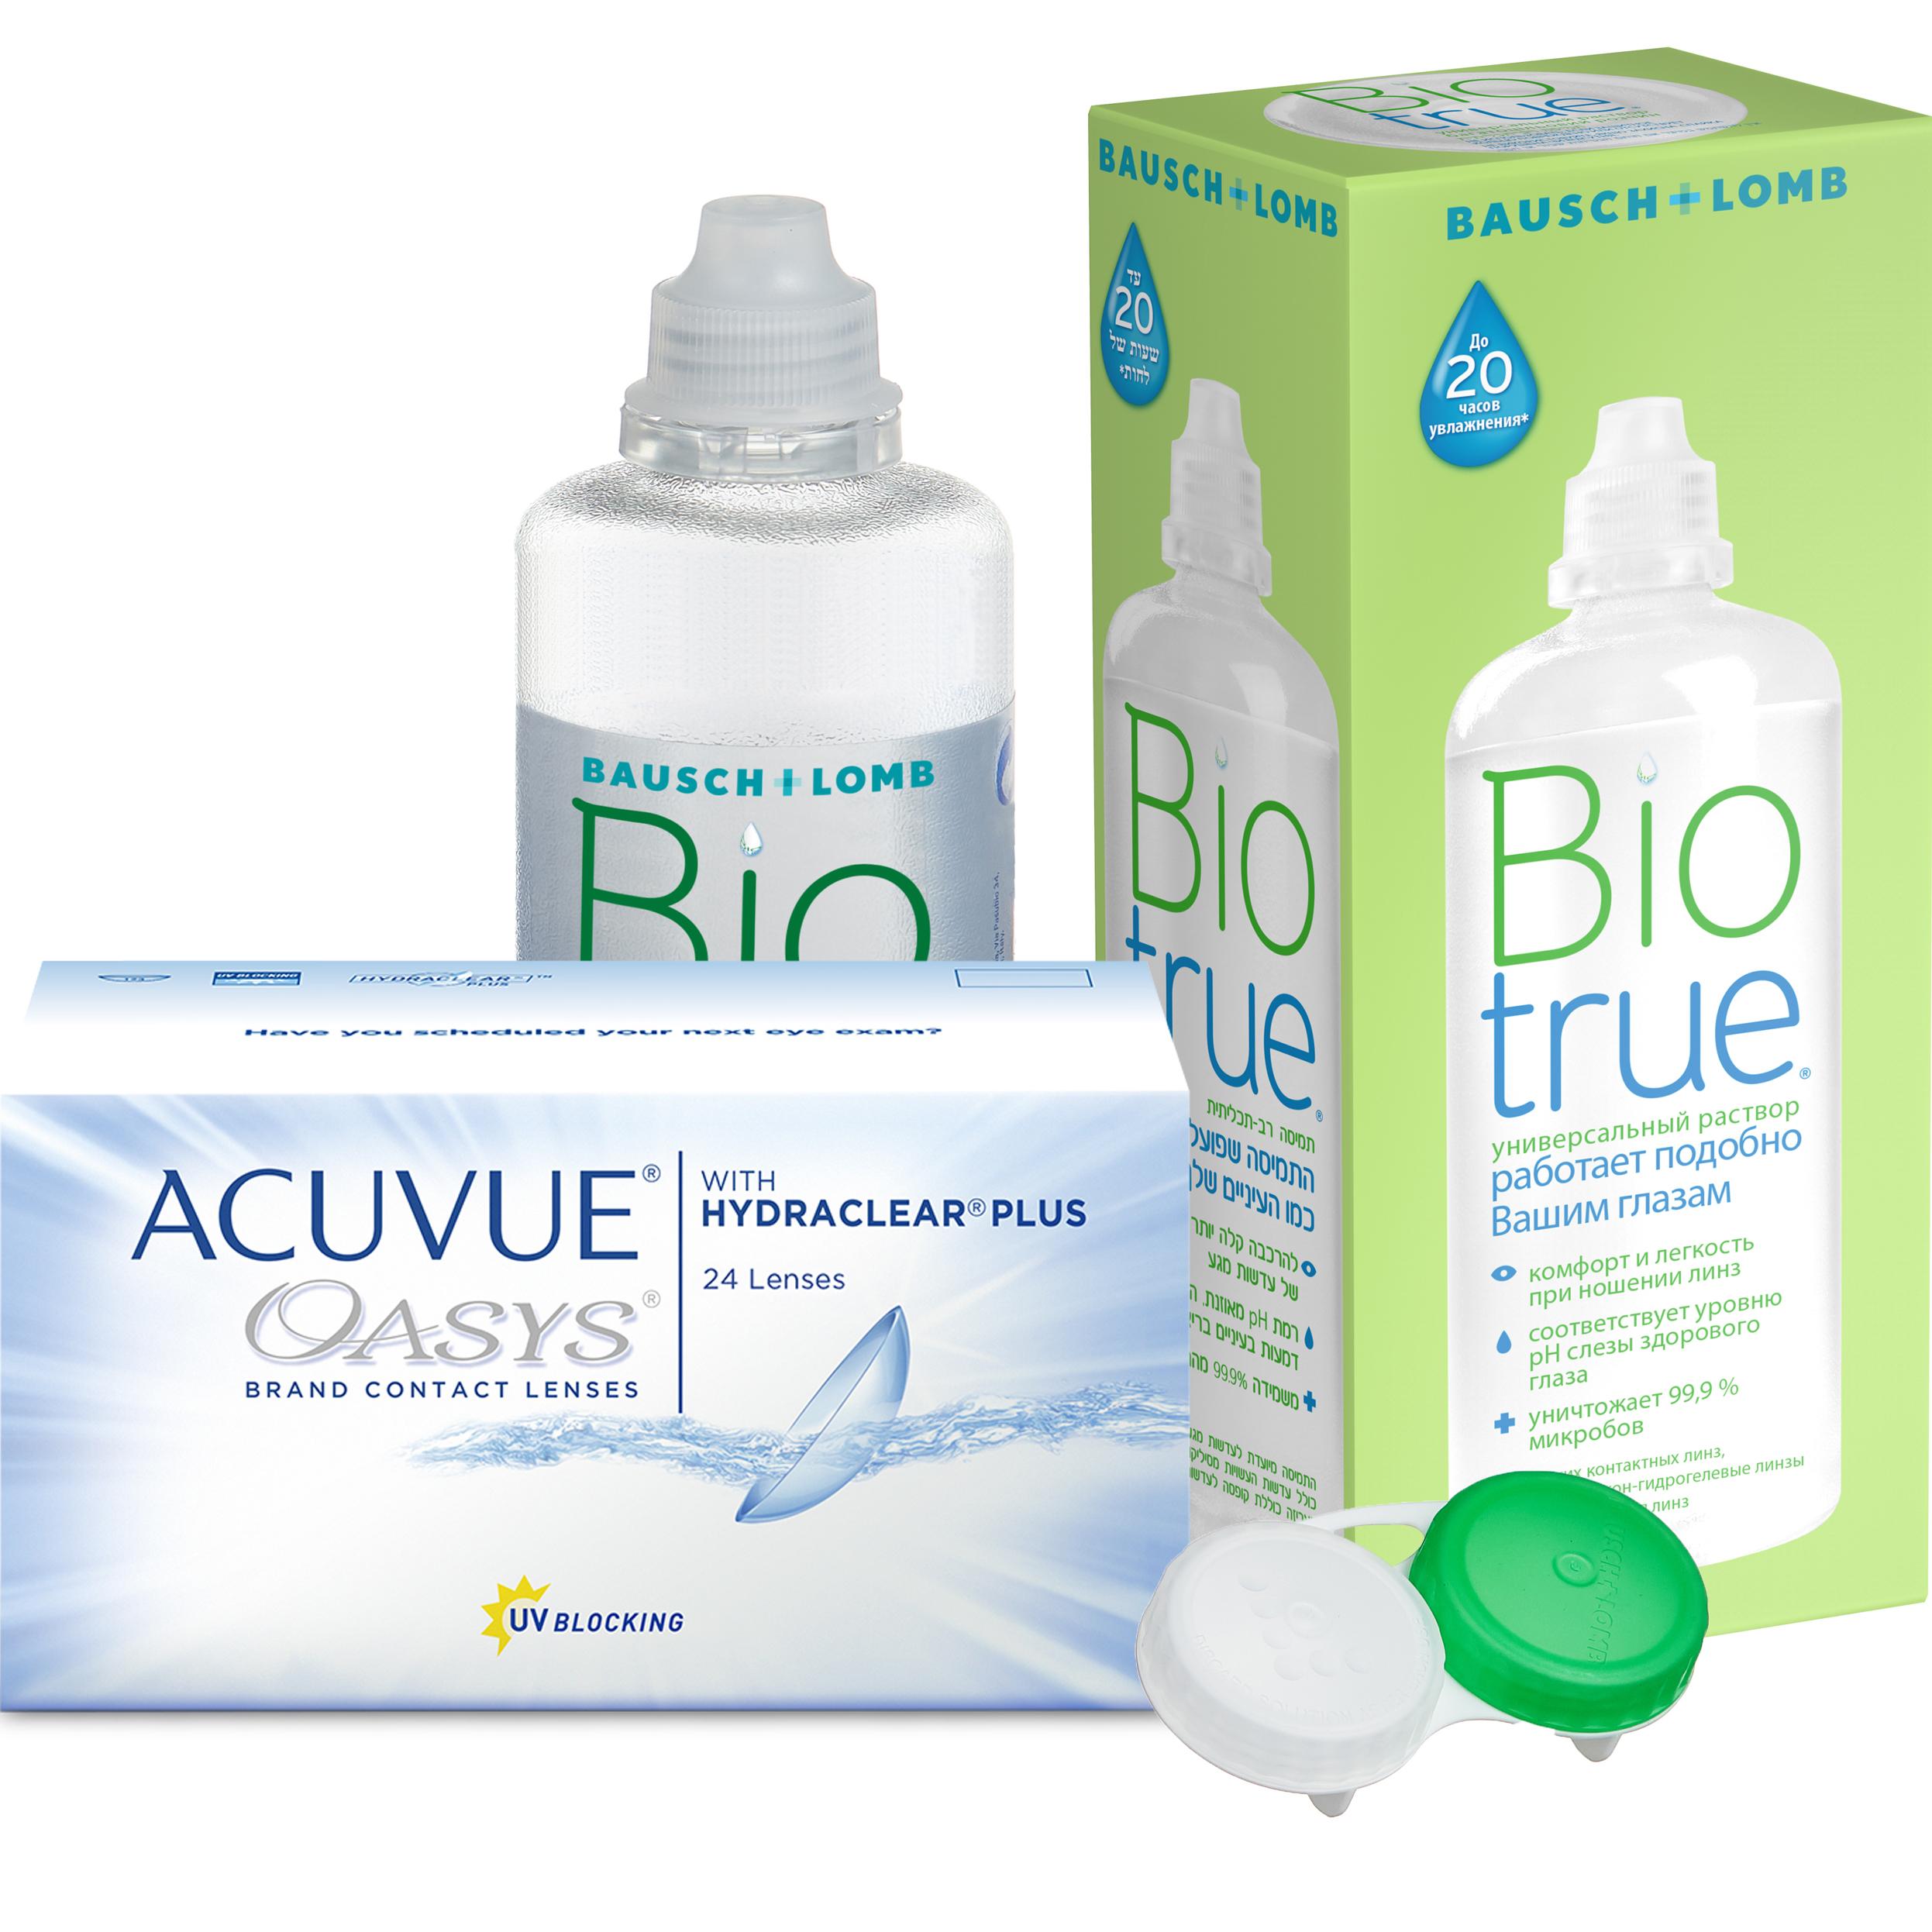 Купить Oasys with Hydraclear Plus 24 линзы + Biotrue, Контактные линзы Acuvue Oasys with Hydraclear Plus 24 линзы R 8.4 -0, 75 + Biotrue 300 мл